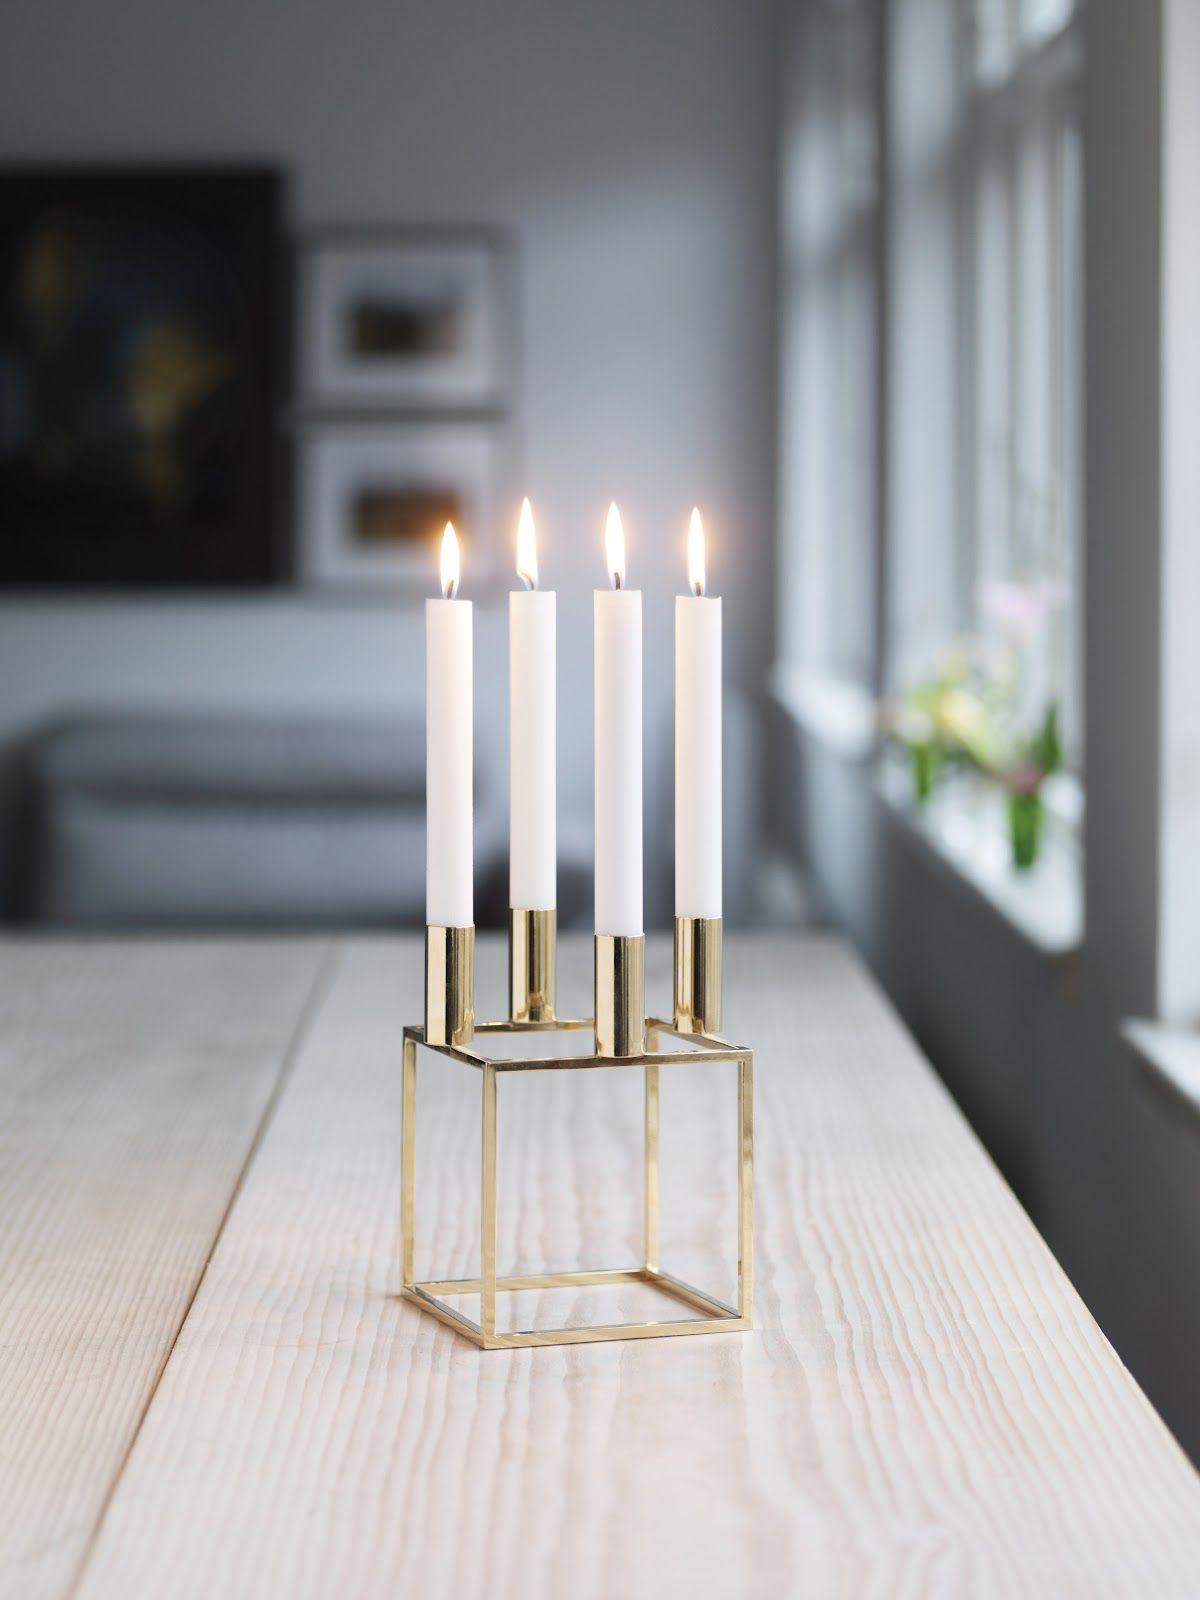 Skandinavisch dekorieren  Skandinavische Accessoire-Klassiker | gold white messing | Pinterest ...